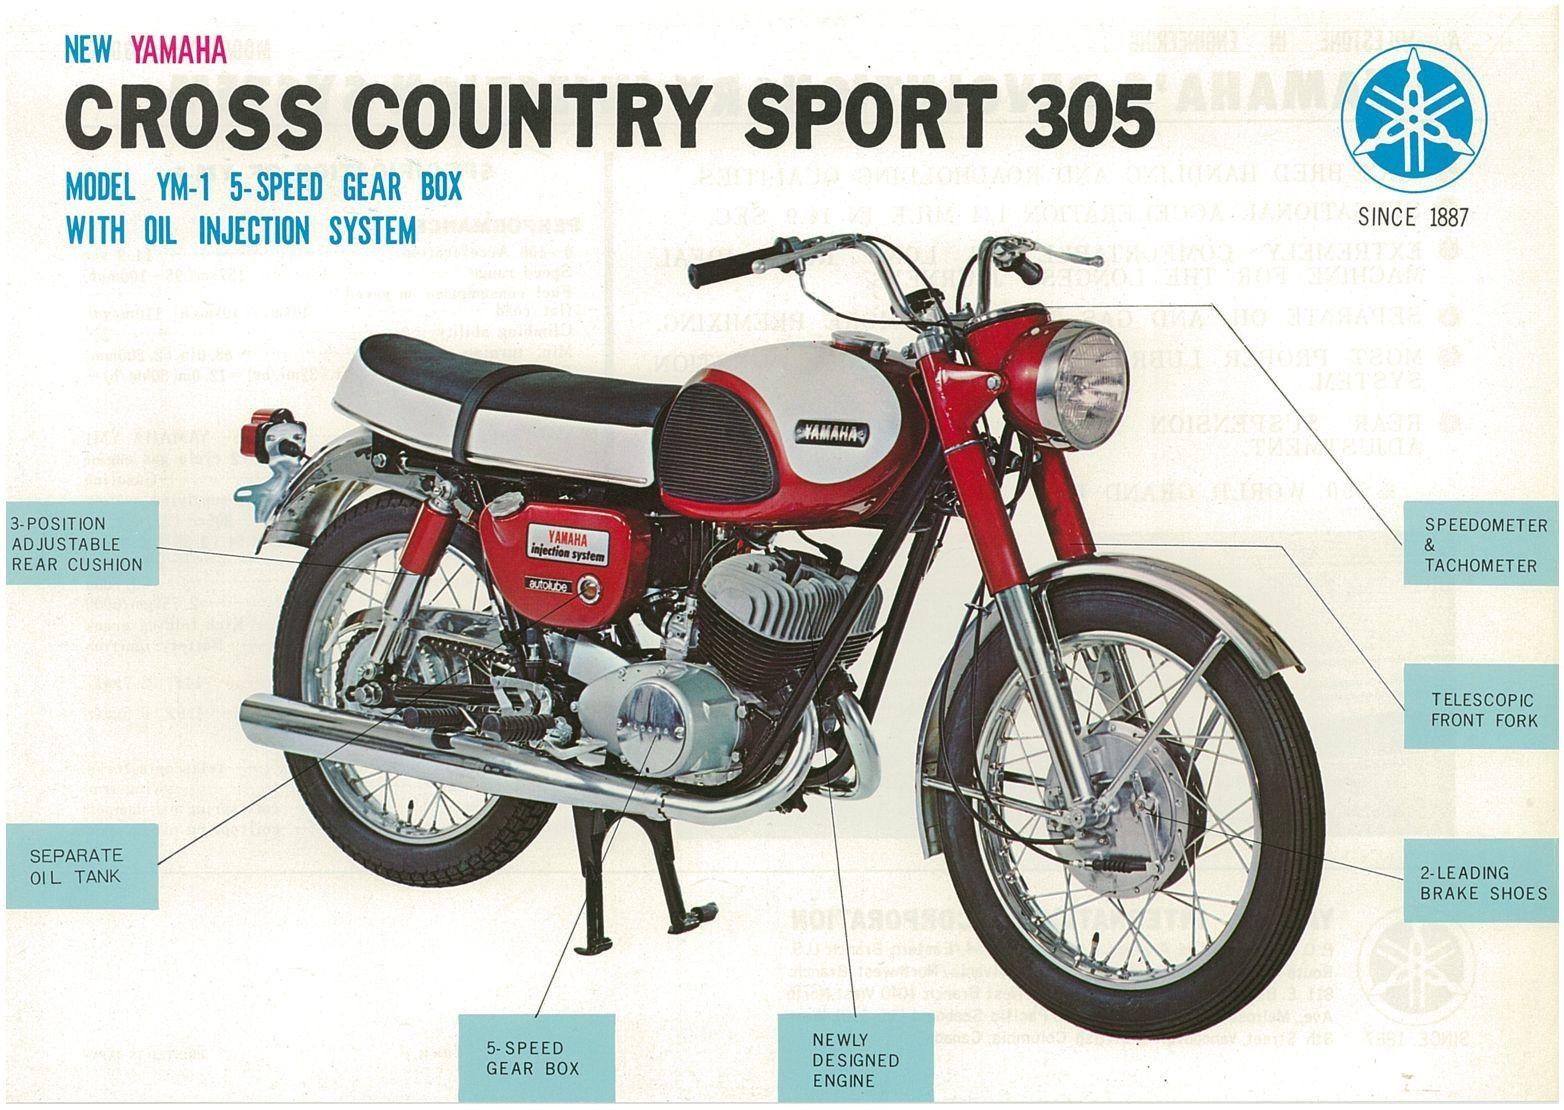 Details About Yamaha Brochure Ym1 1964 1965 1966 Sales Catalog Repro Yamaha Vintage Honda Motorcycles Yamaha Bikes